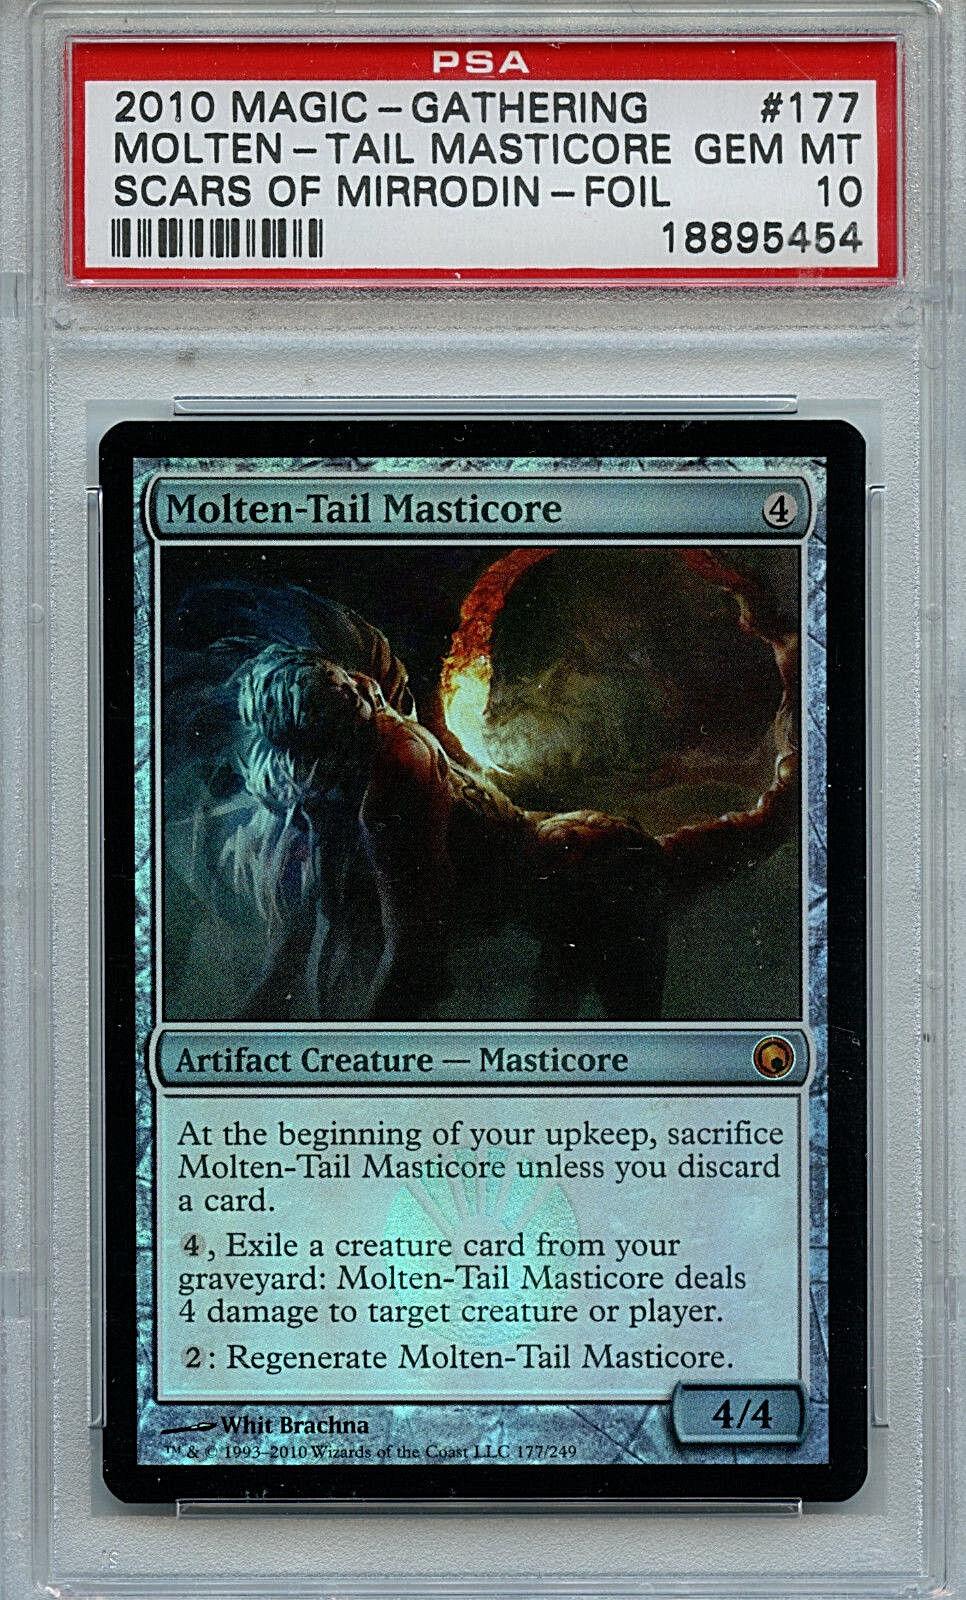 MTG Molten-Tail Masticore PSA 10 Gem Mint Scars of Mirrodin Foil Magic Card